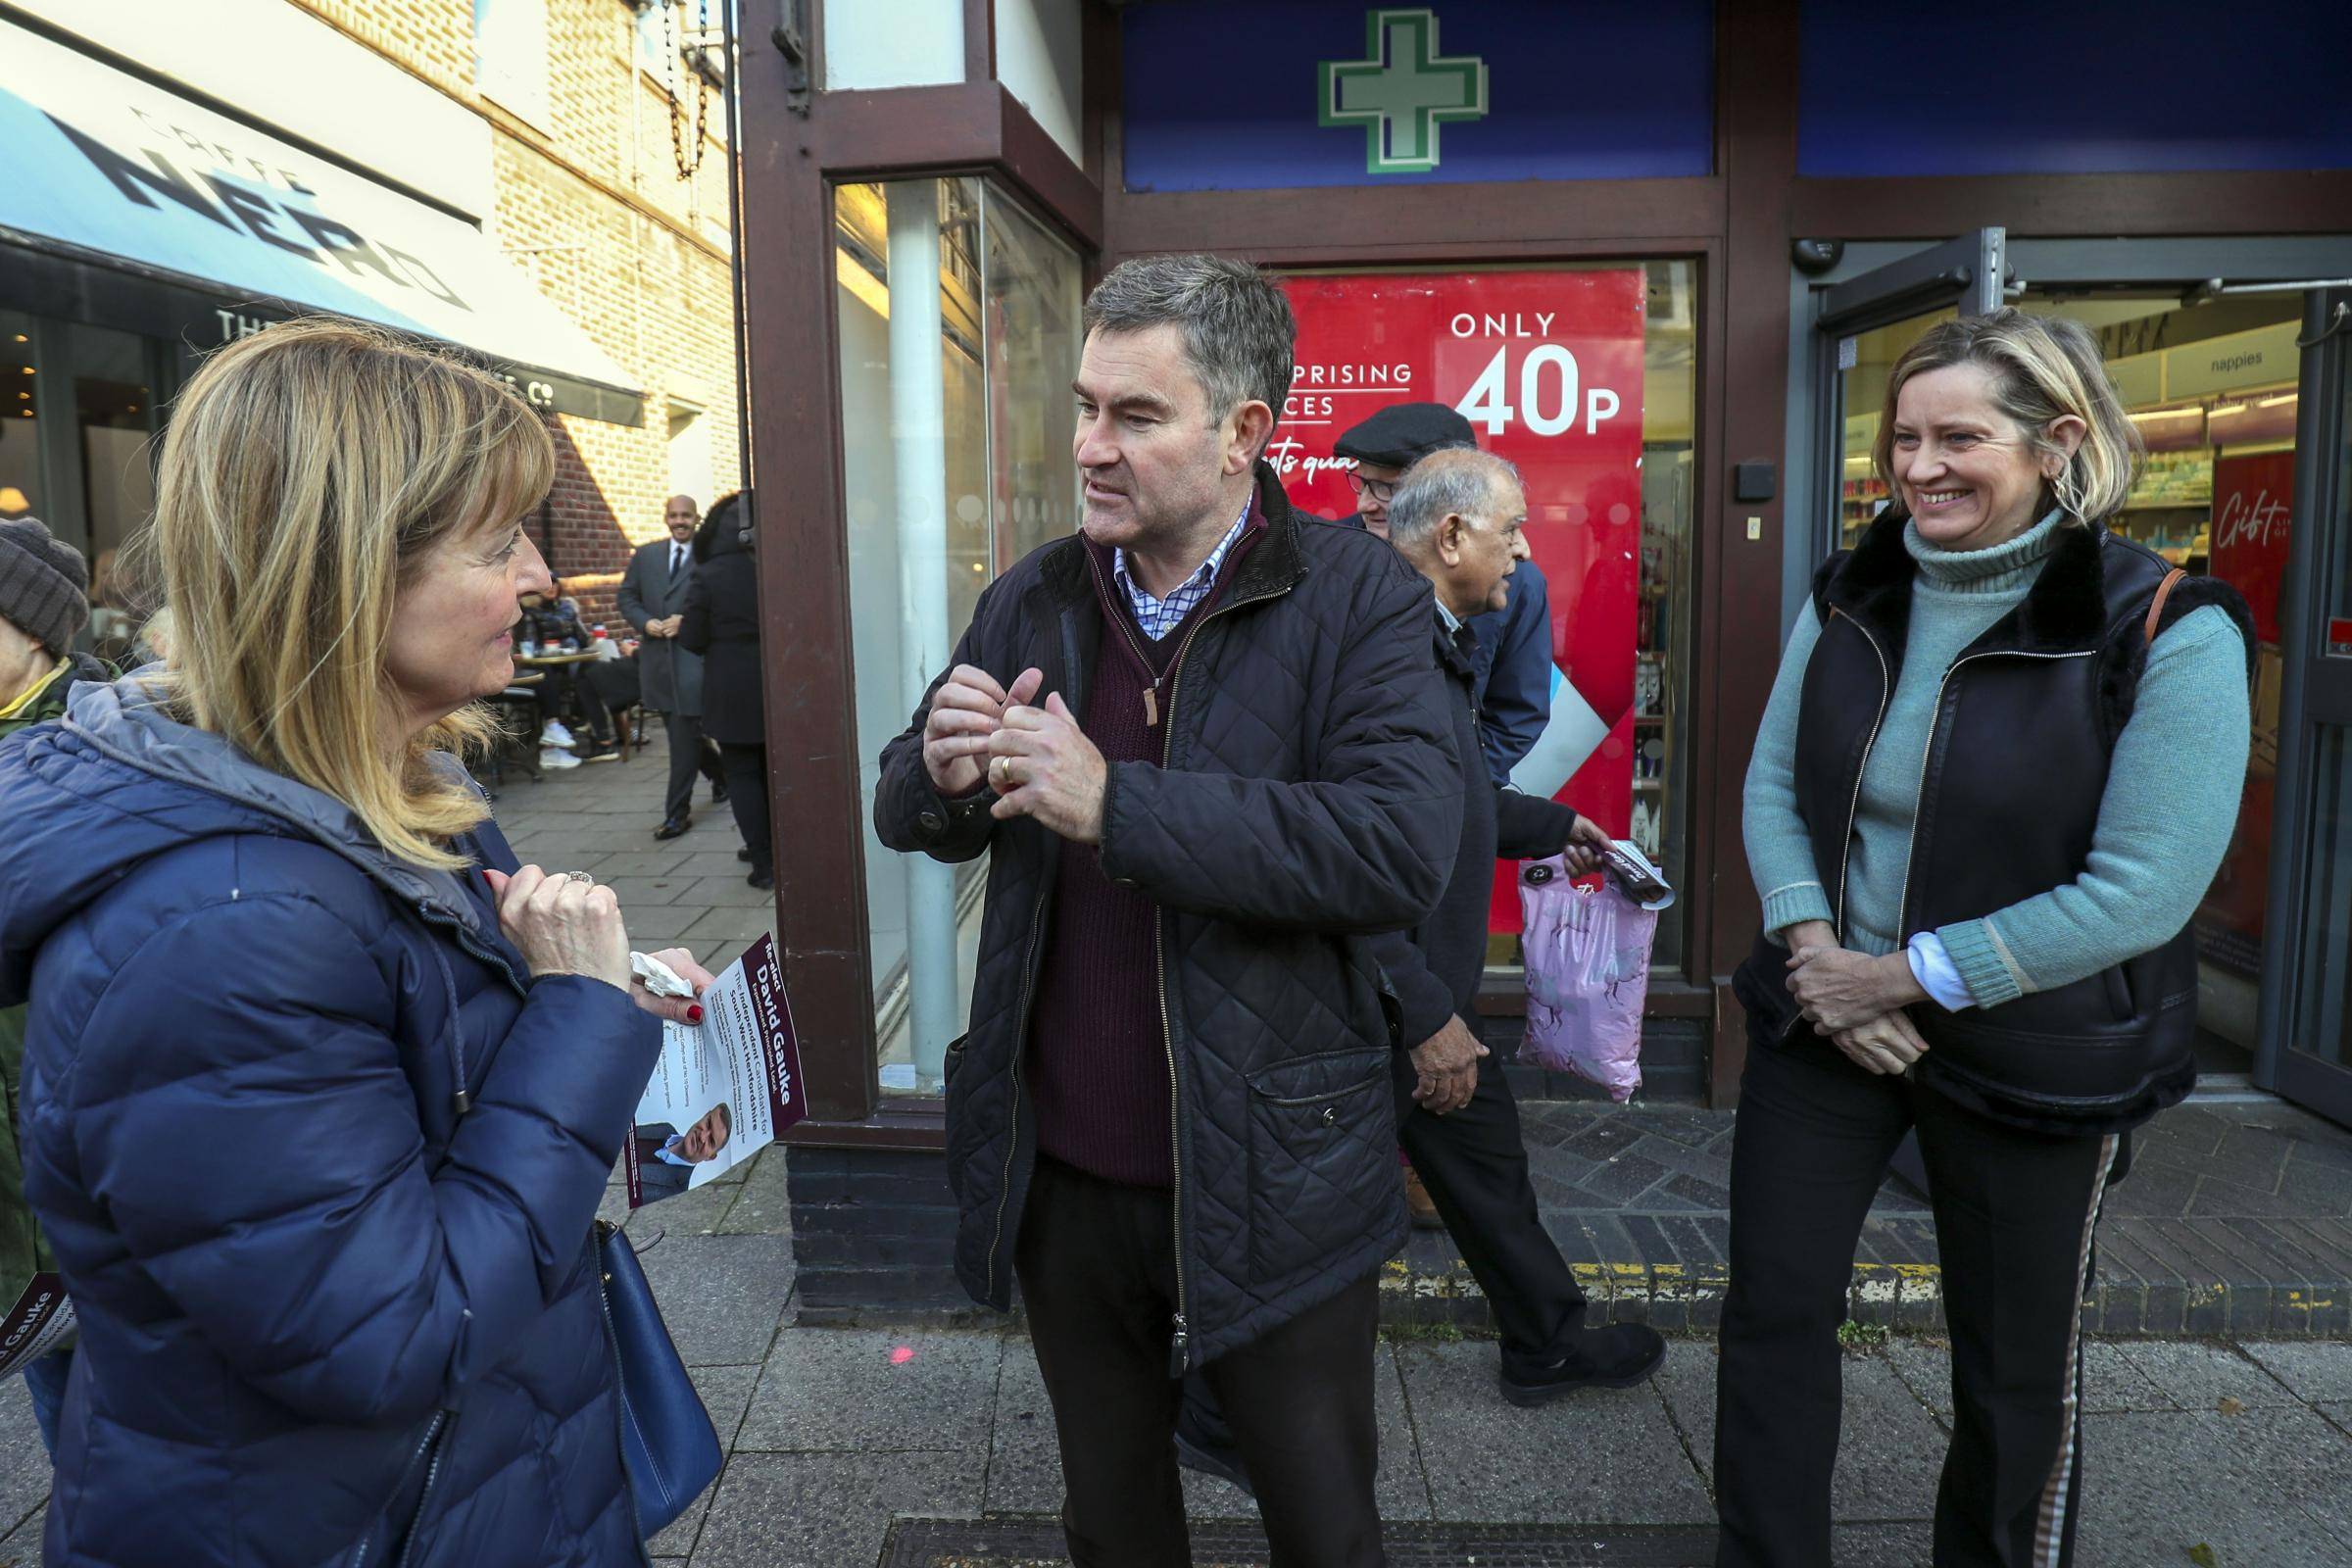 Amber Rudd joins fellow Tory rebel David Gauke on campaign trail - Chelmsford Weekly News